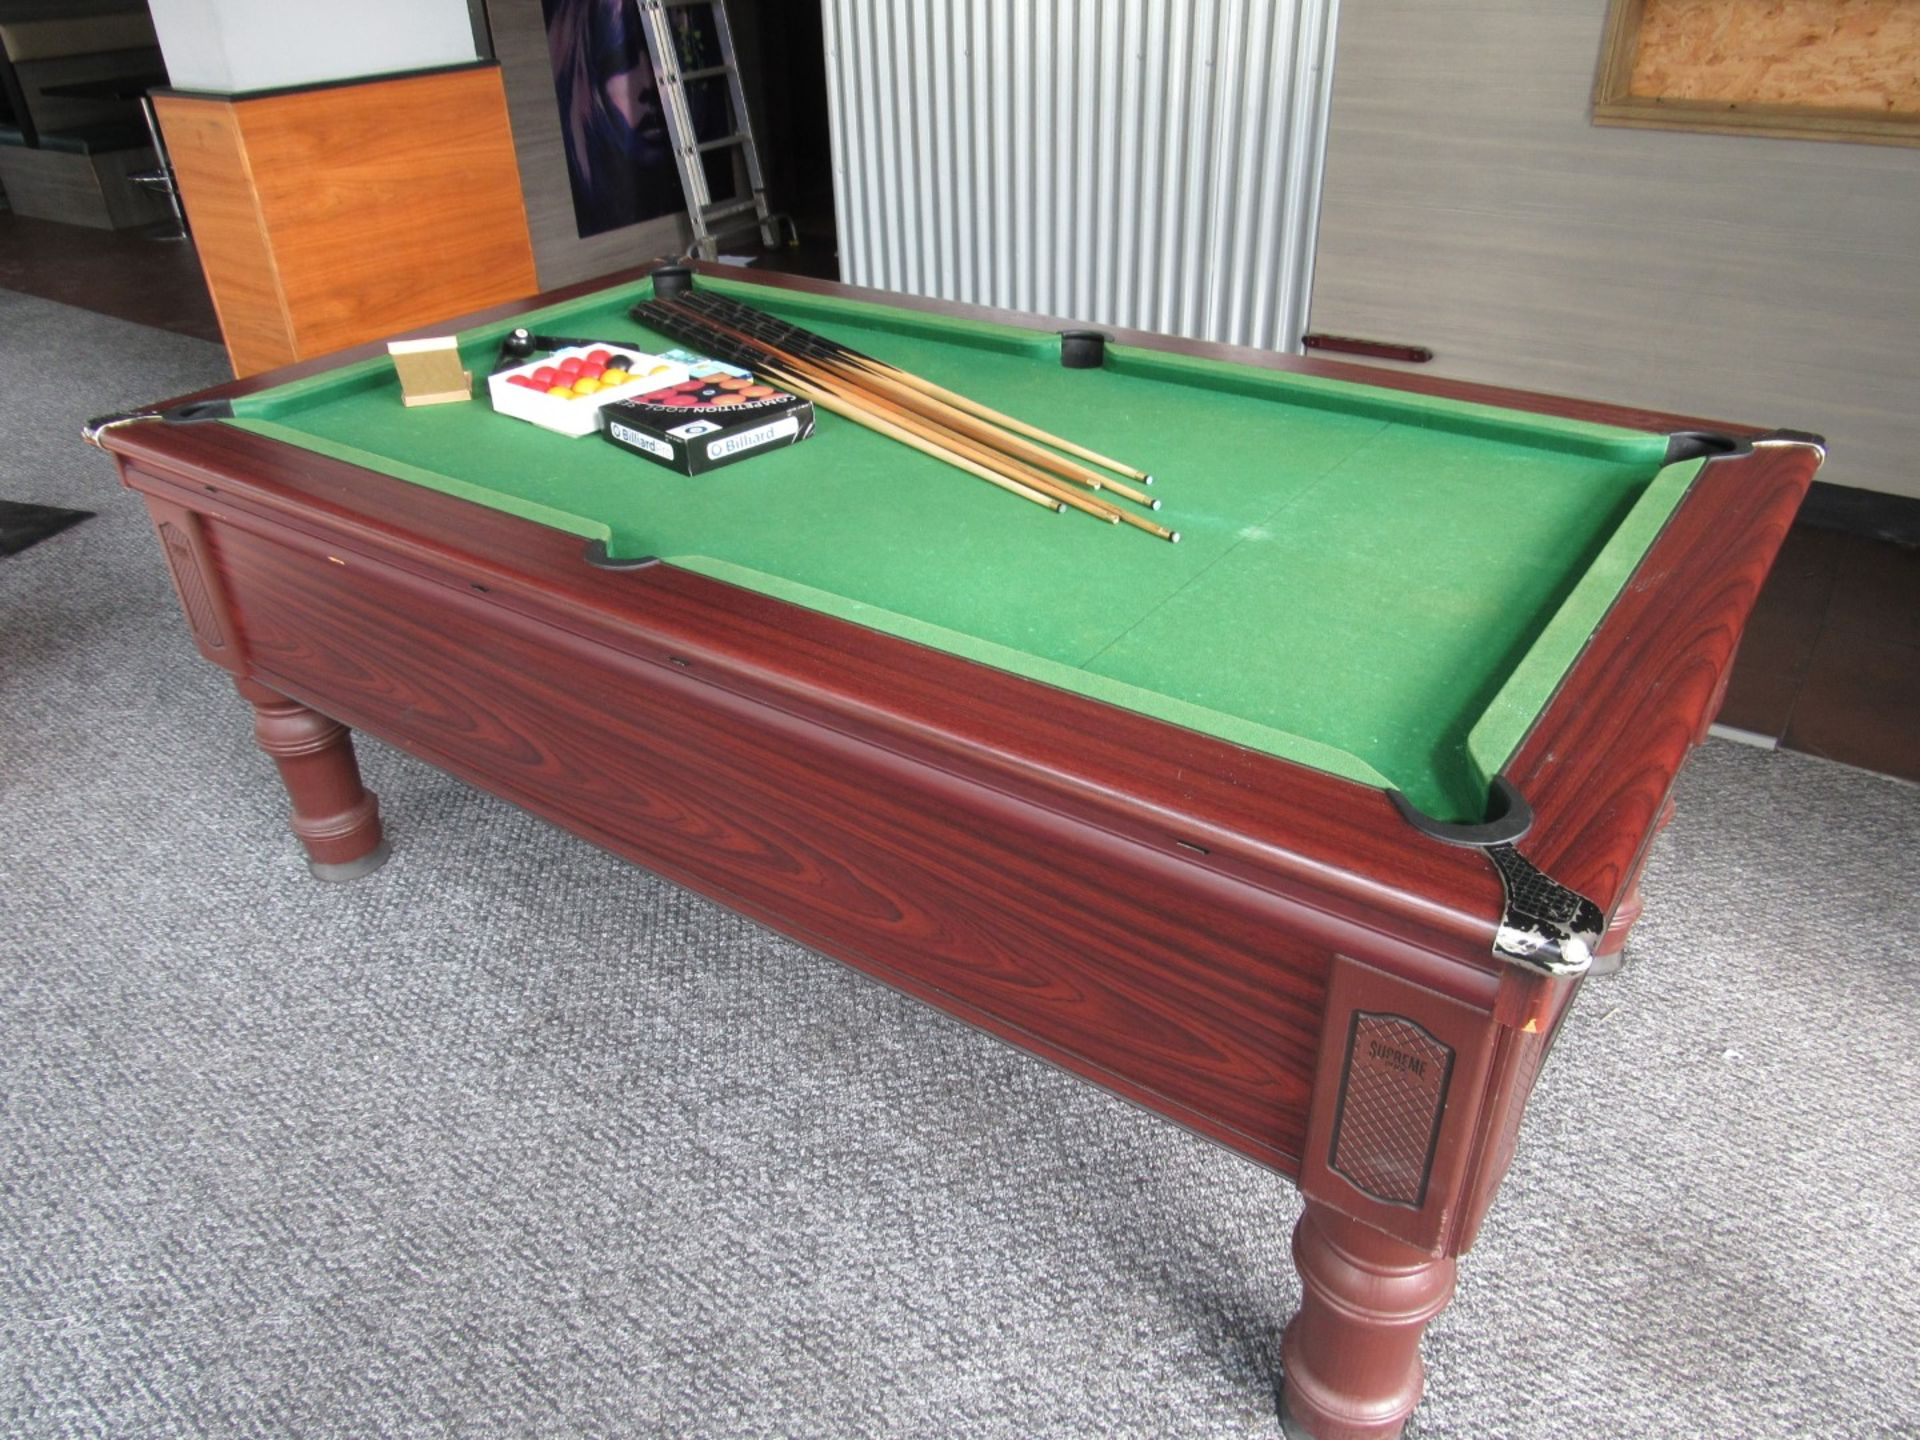 Supreme Pool, Pay to Play Billiard Table - Image 6 of 9